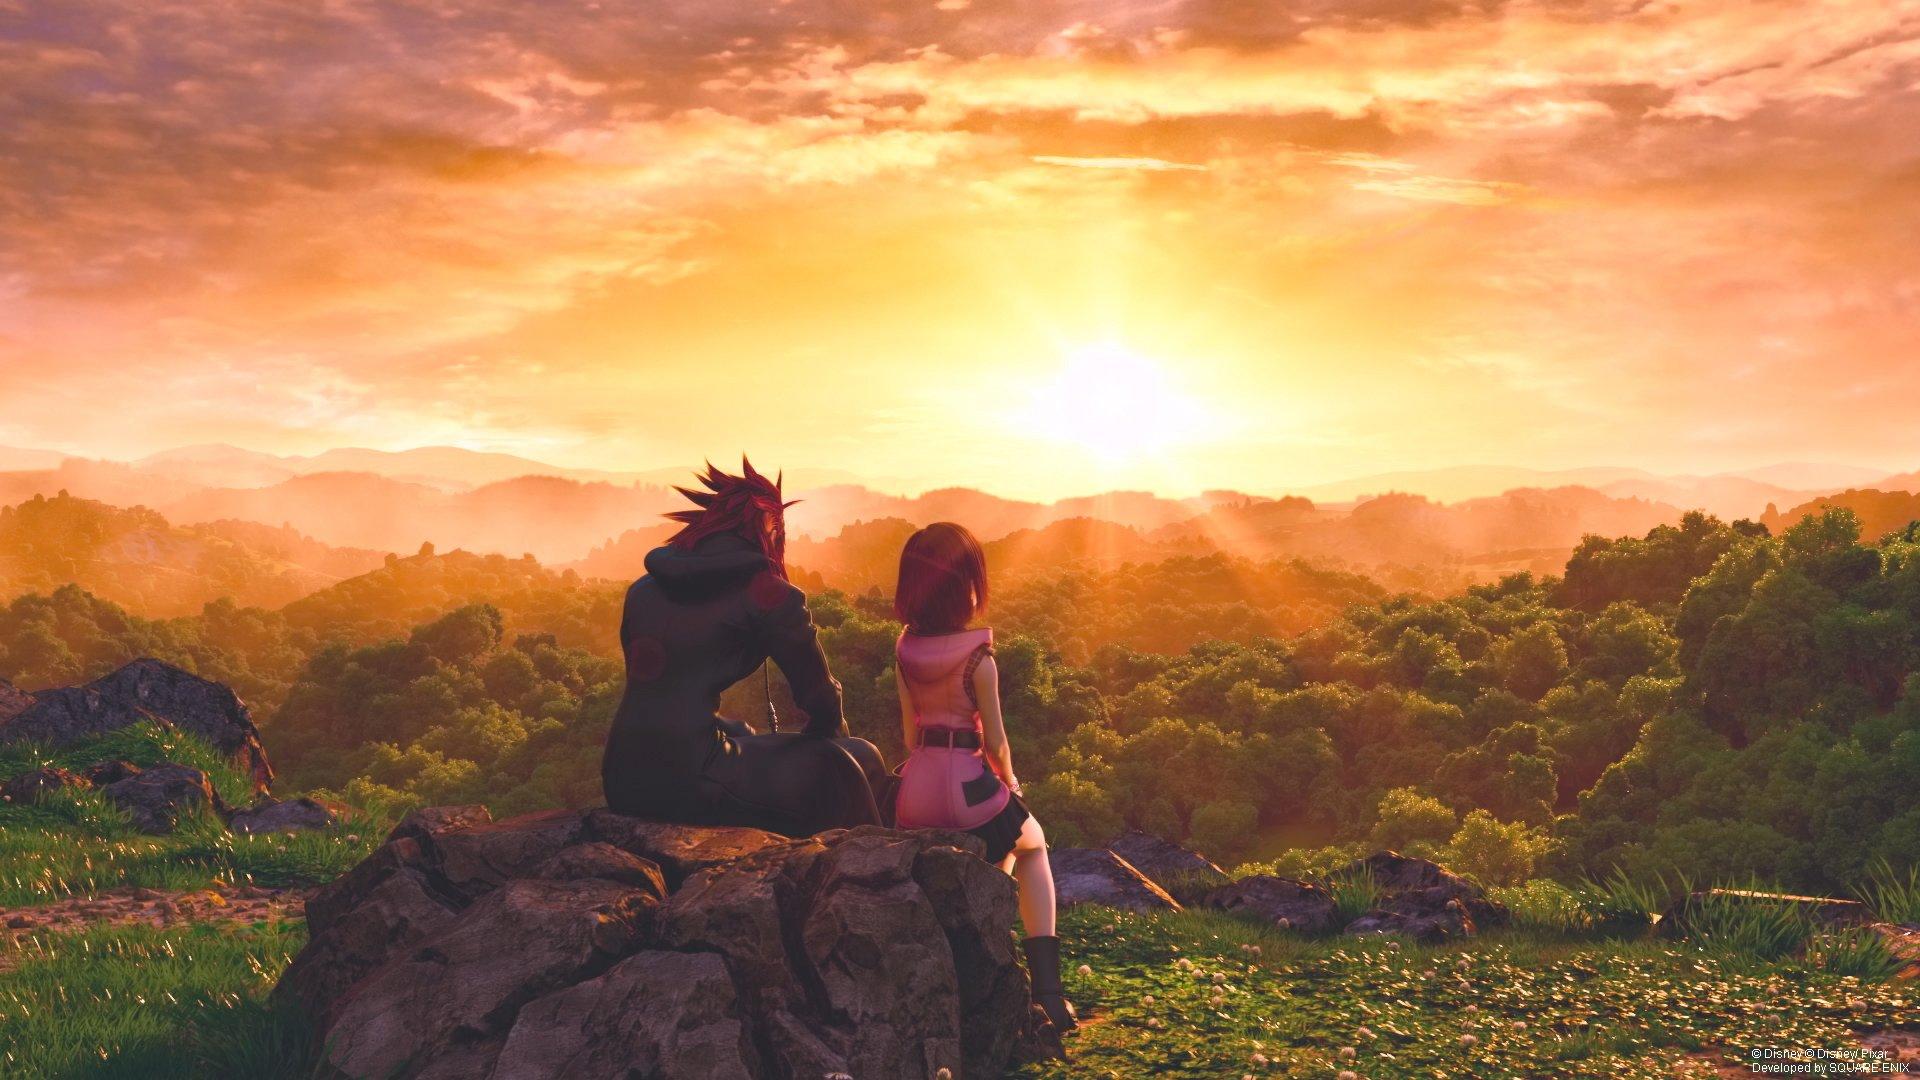 Kingdom Hearts III - Xbox One by Square Enix (Image #16)